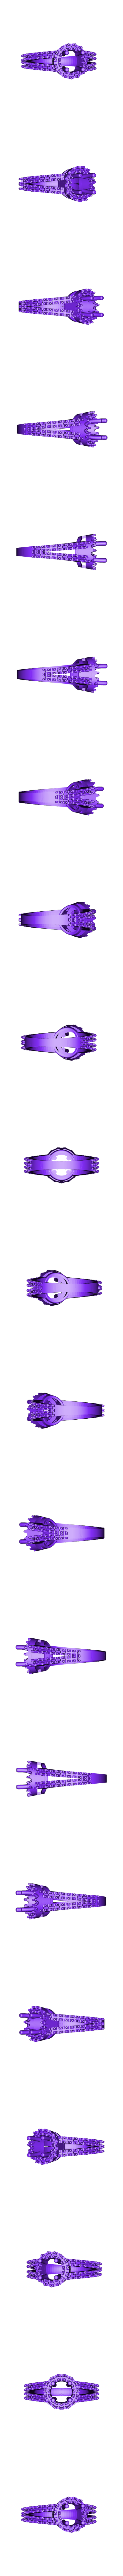 RG26844 STL.stl Download STL file Jewelry 3D CAD Design Wedding Ring • 3D print design, VR3D